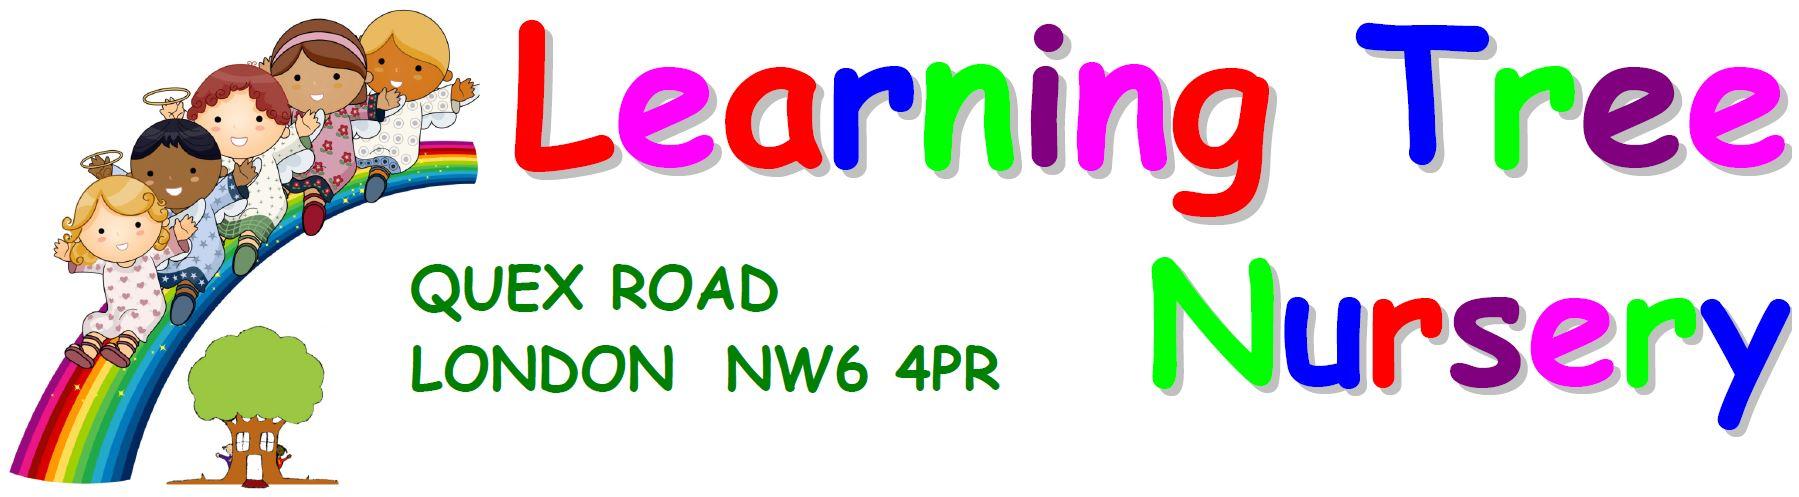 The Learning Tree Nursery